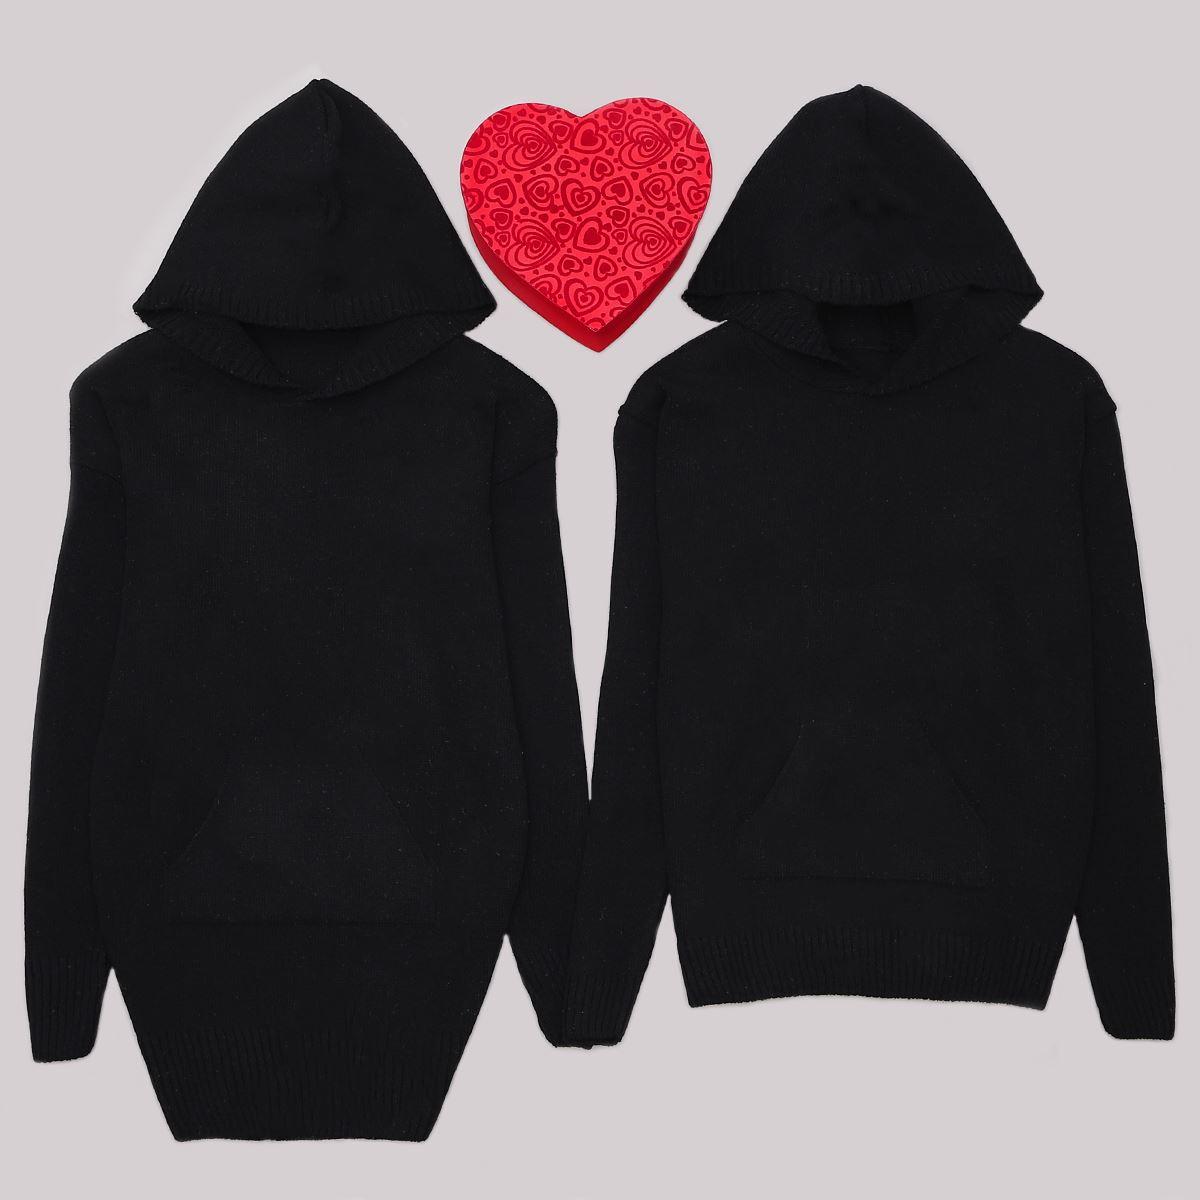 Siyah Kapşonlu Sevgili Kombini SVG121